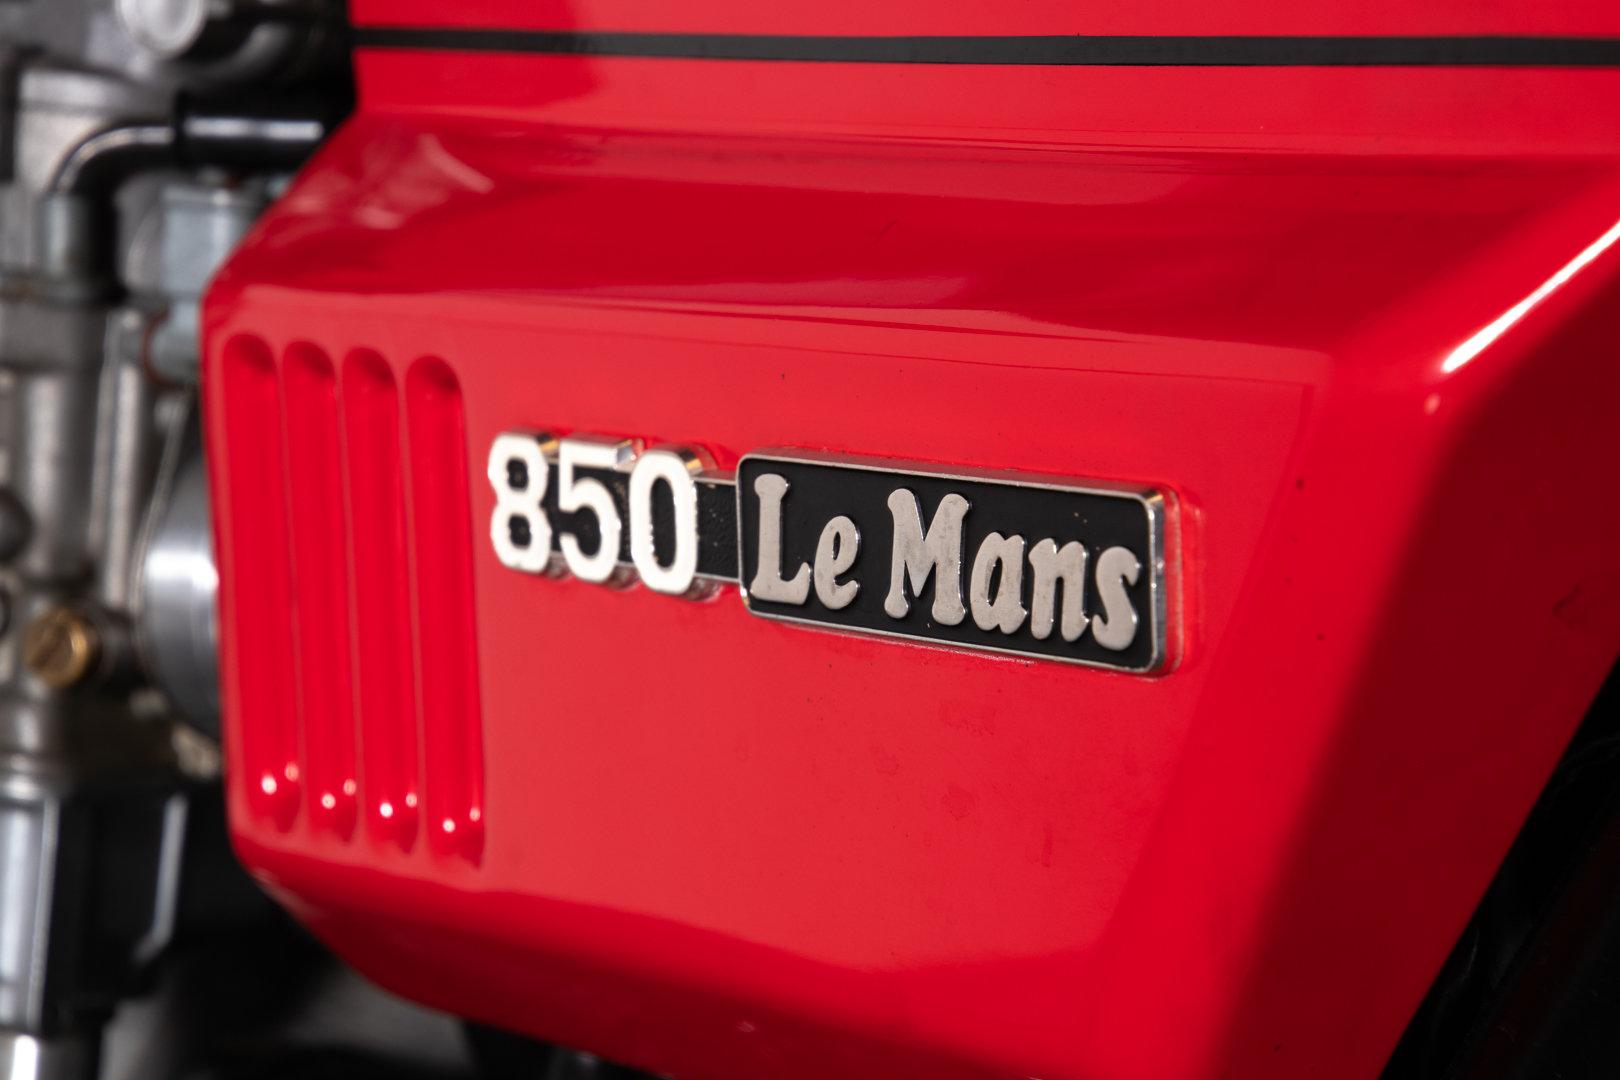 MOTO GUZZI - 850 LE MANS - 1977 For Sale (picture 6 of 6)